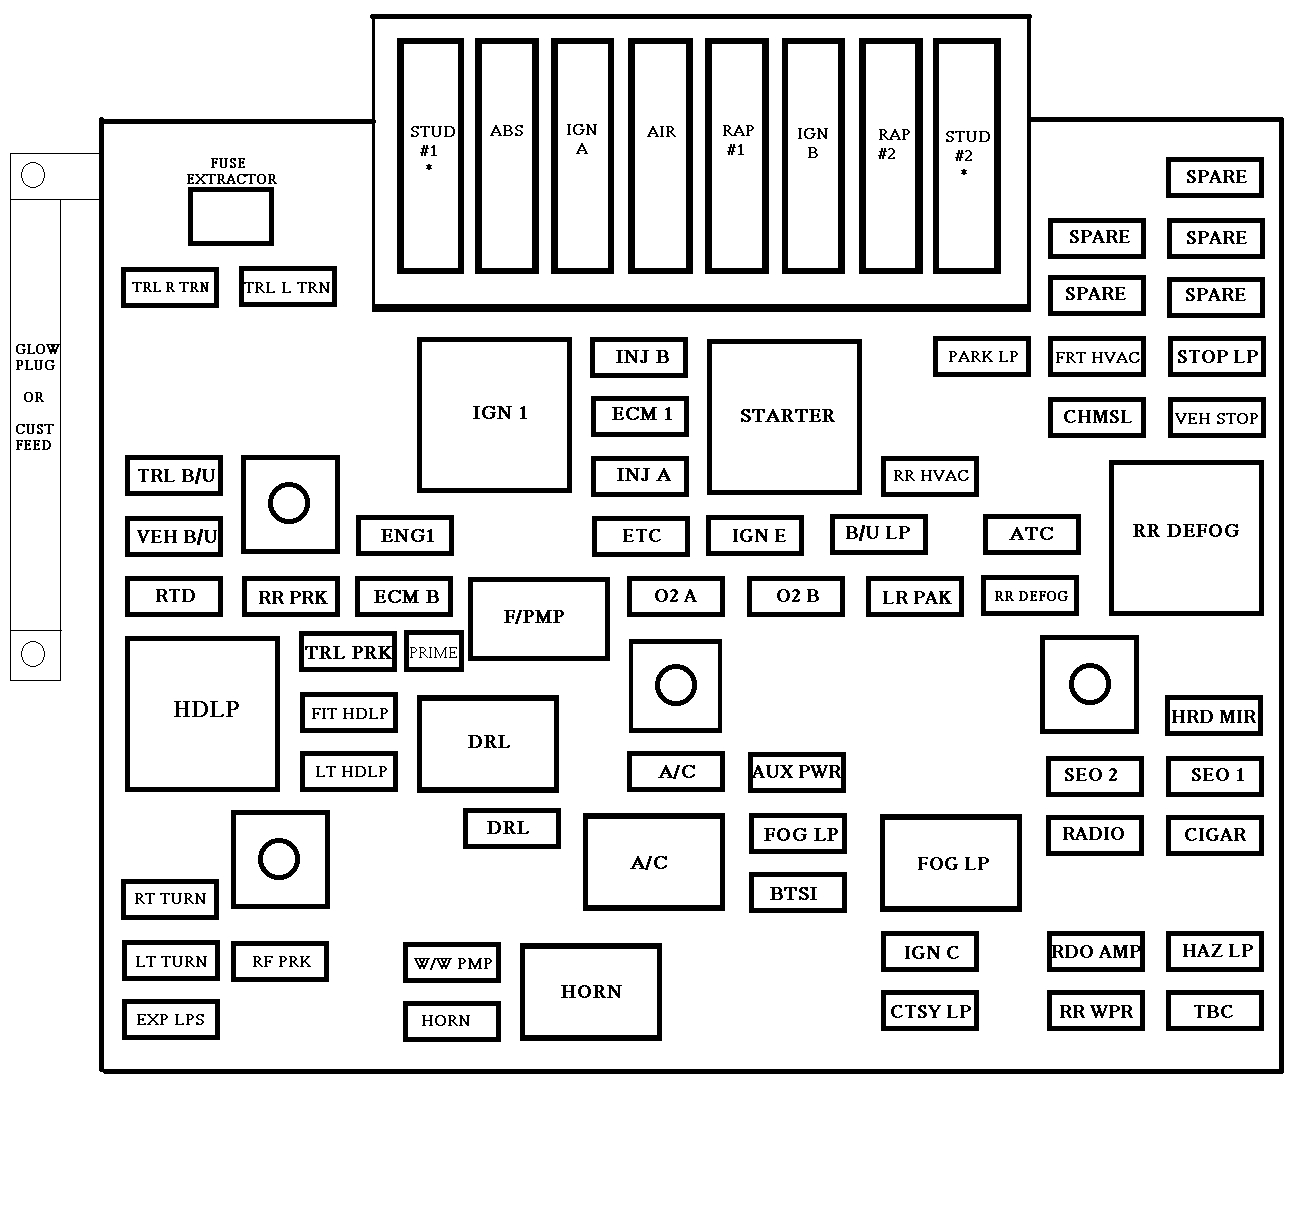 2006 Chrysler Crossfire Fuse Box Diagram Wiring Schematic